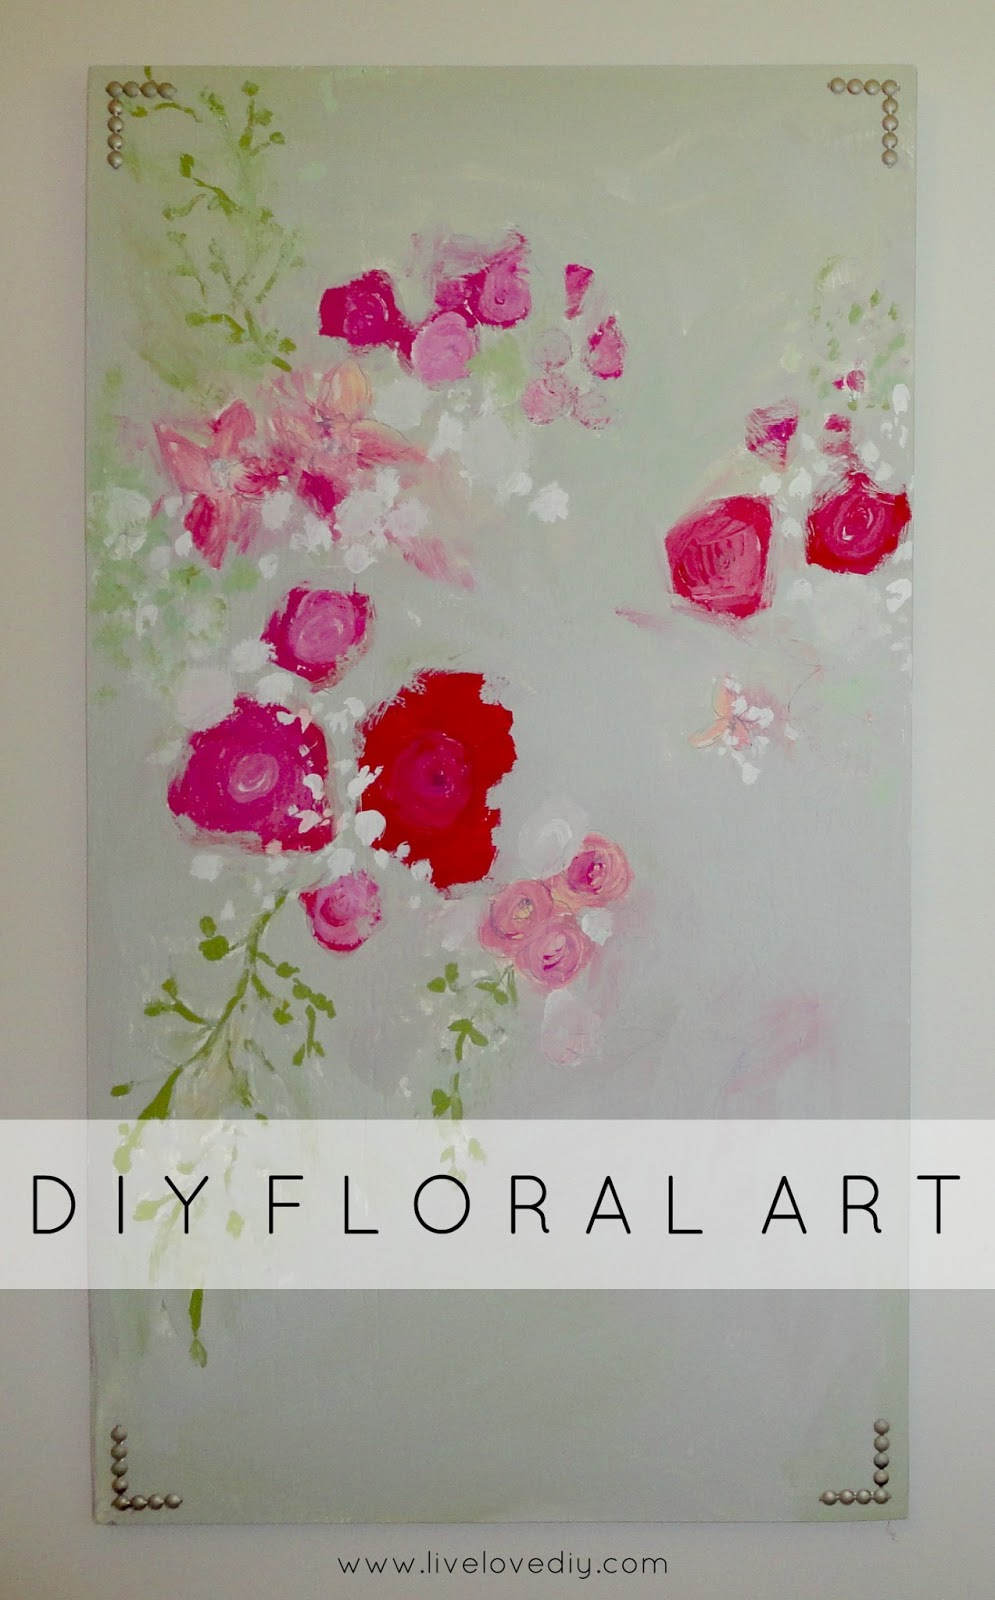 & LiveLoveDIY: 10 DIY Art Ideas: Easy Ways to Decorate Your Walls!